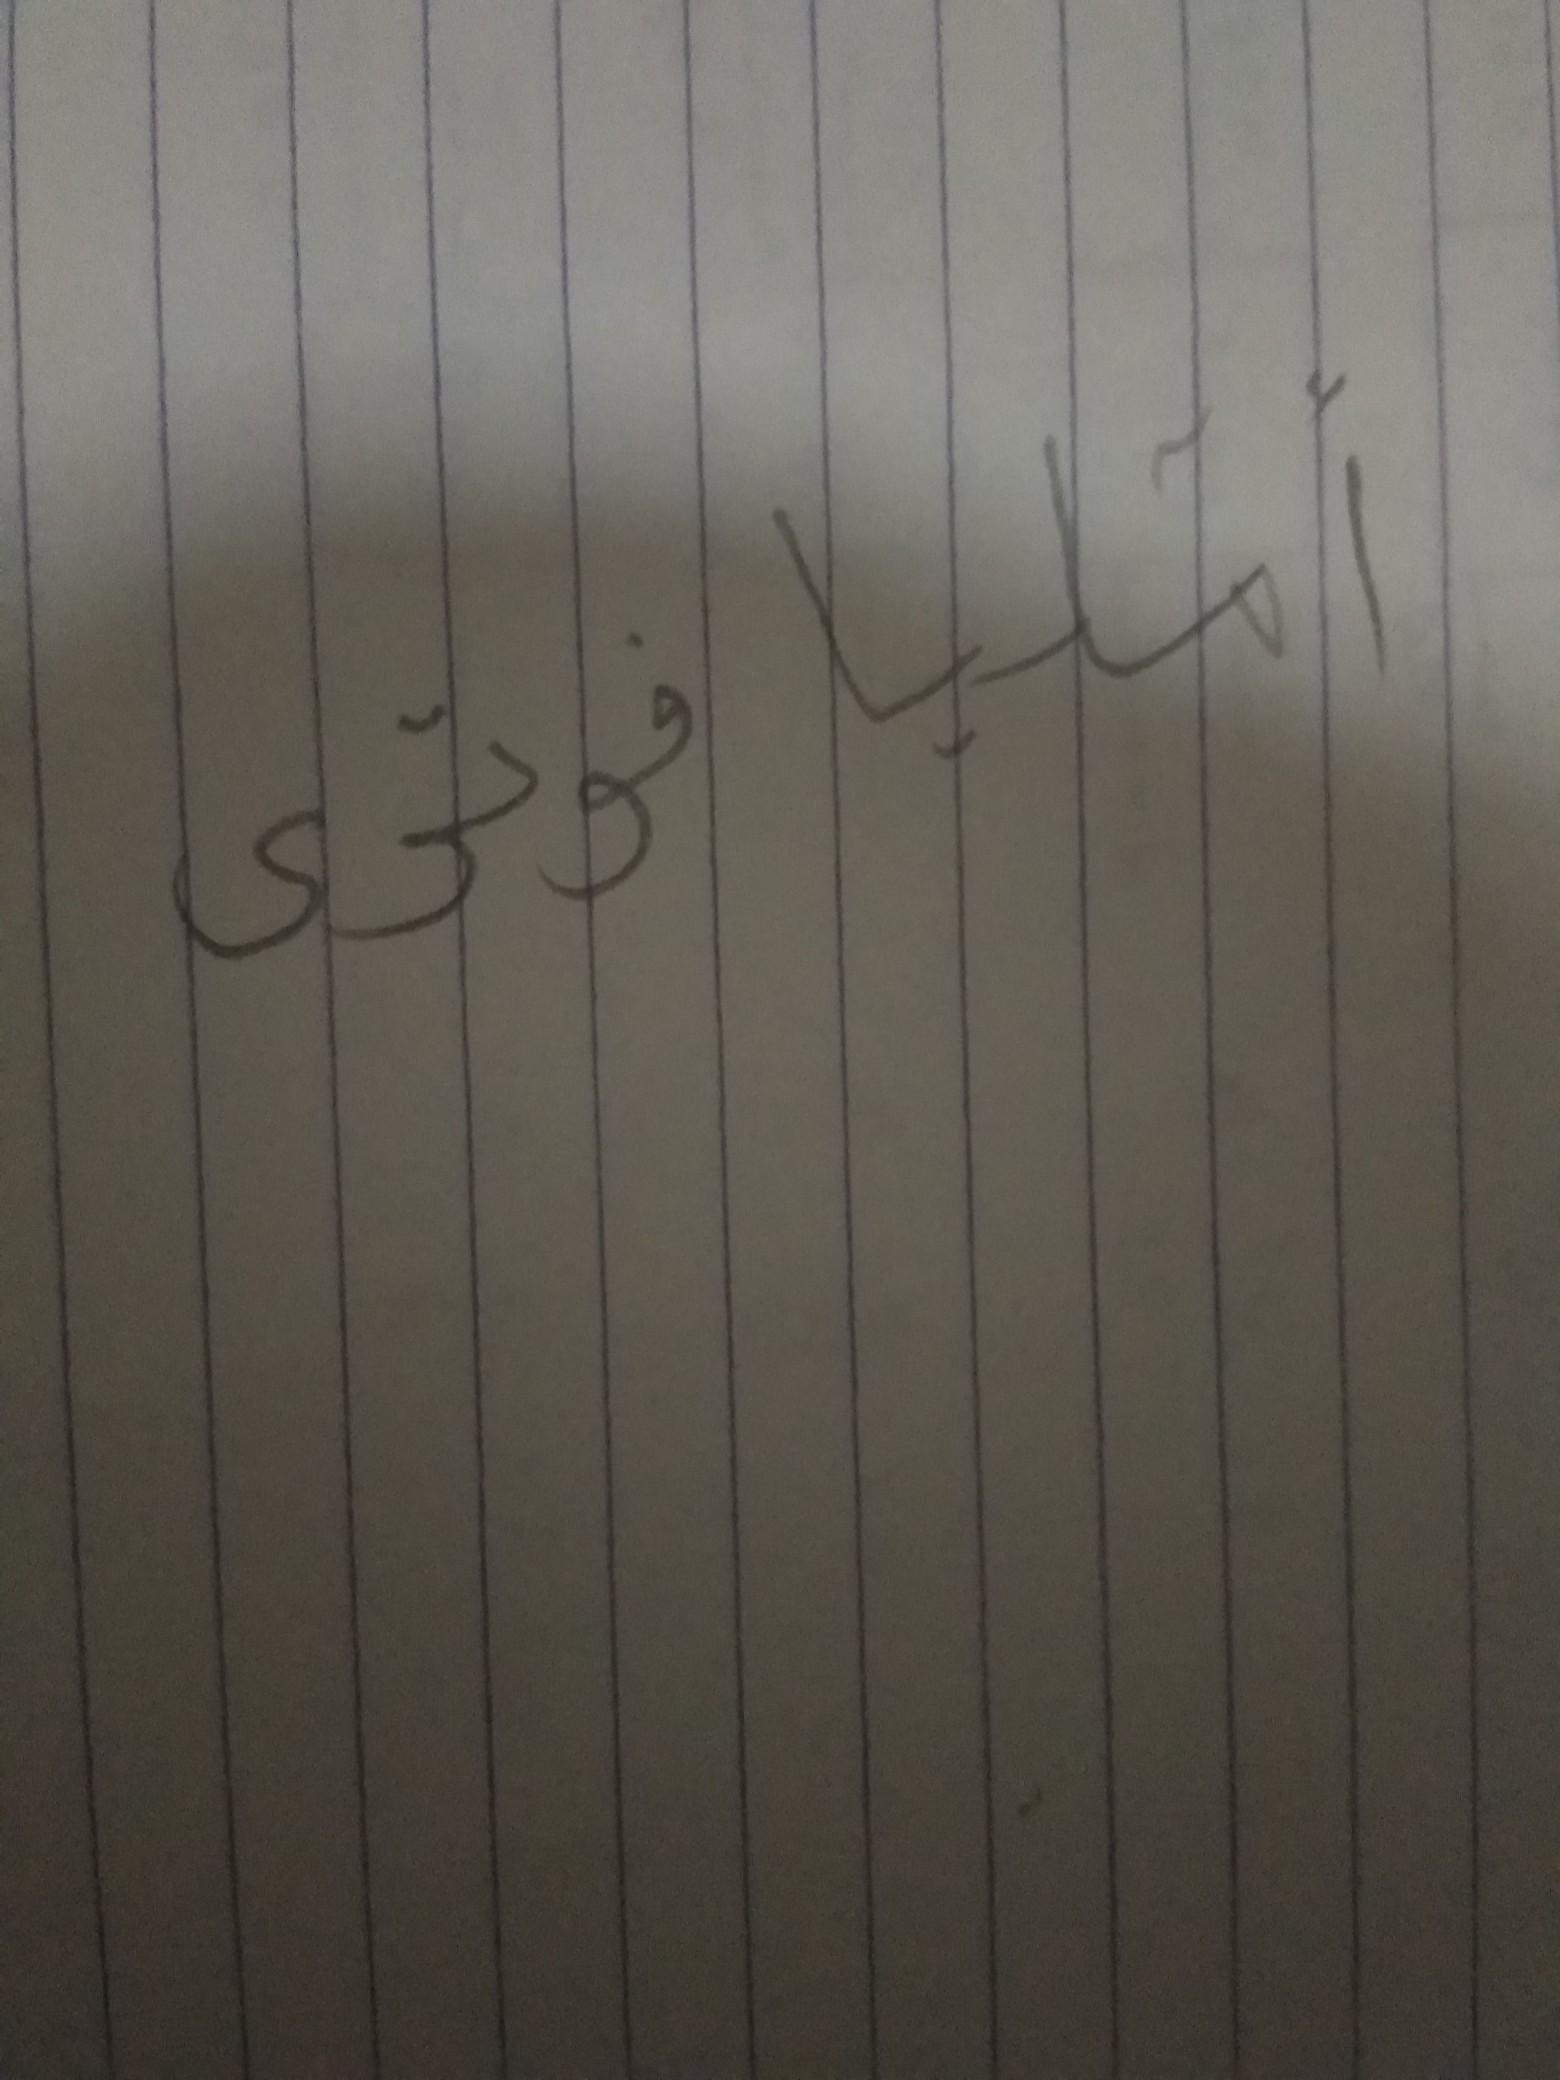 Tulisan Arab Melayu Untuk Nama Amelia Putri Brainly Co Id